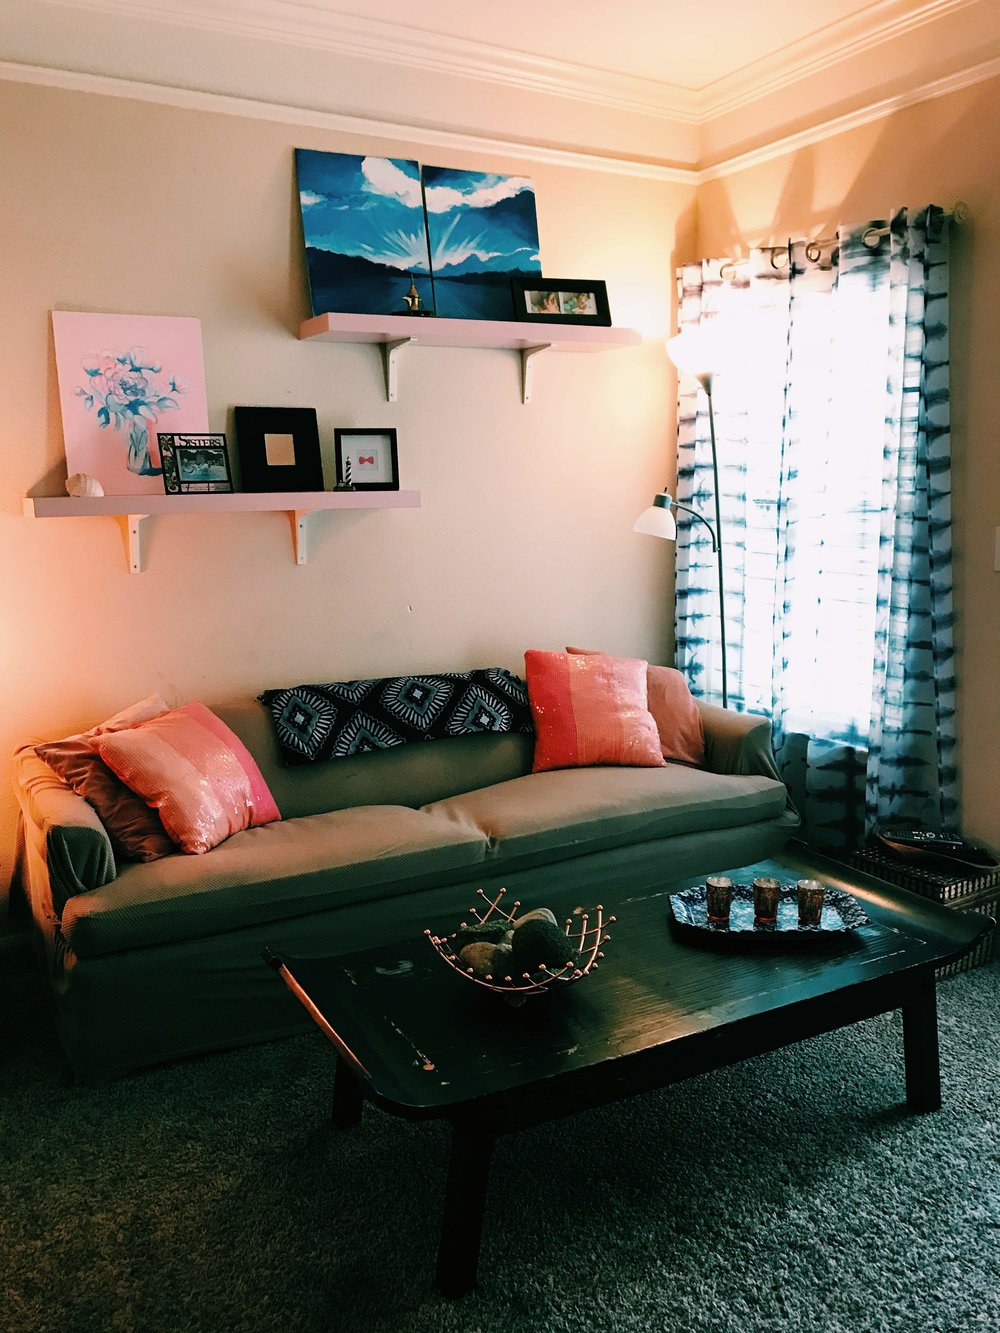 Home Sweet Heel Clicks - Living Room Decor (11).jpg